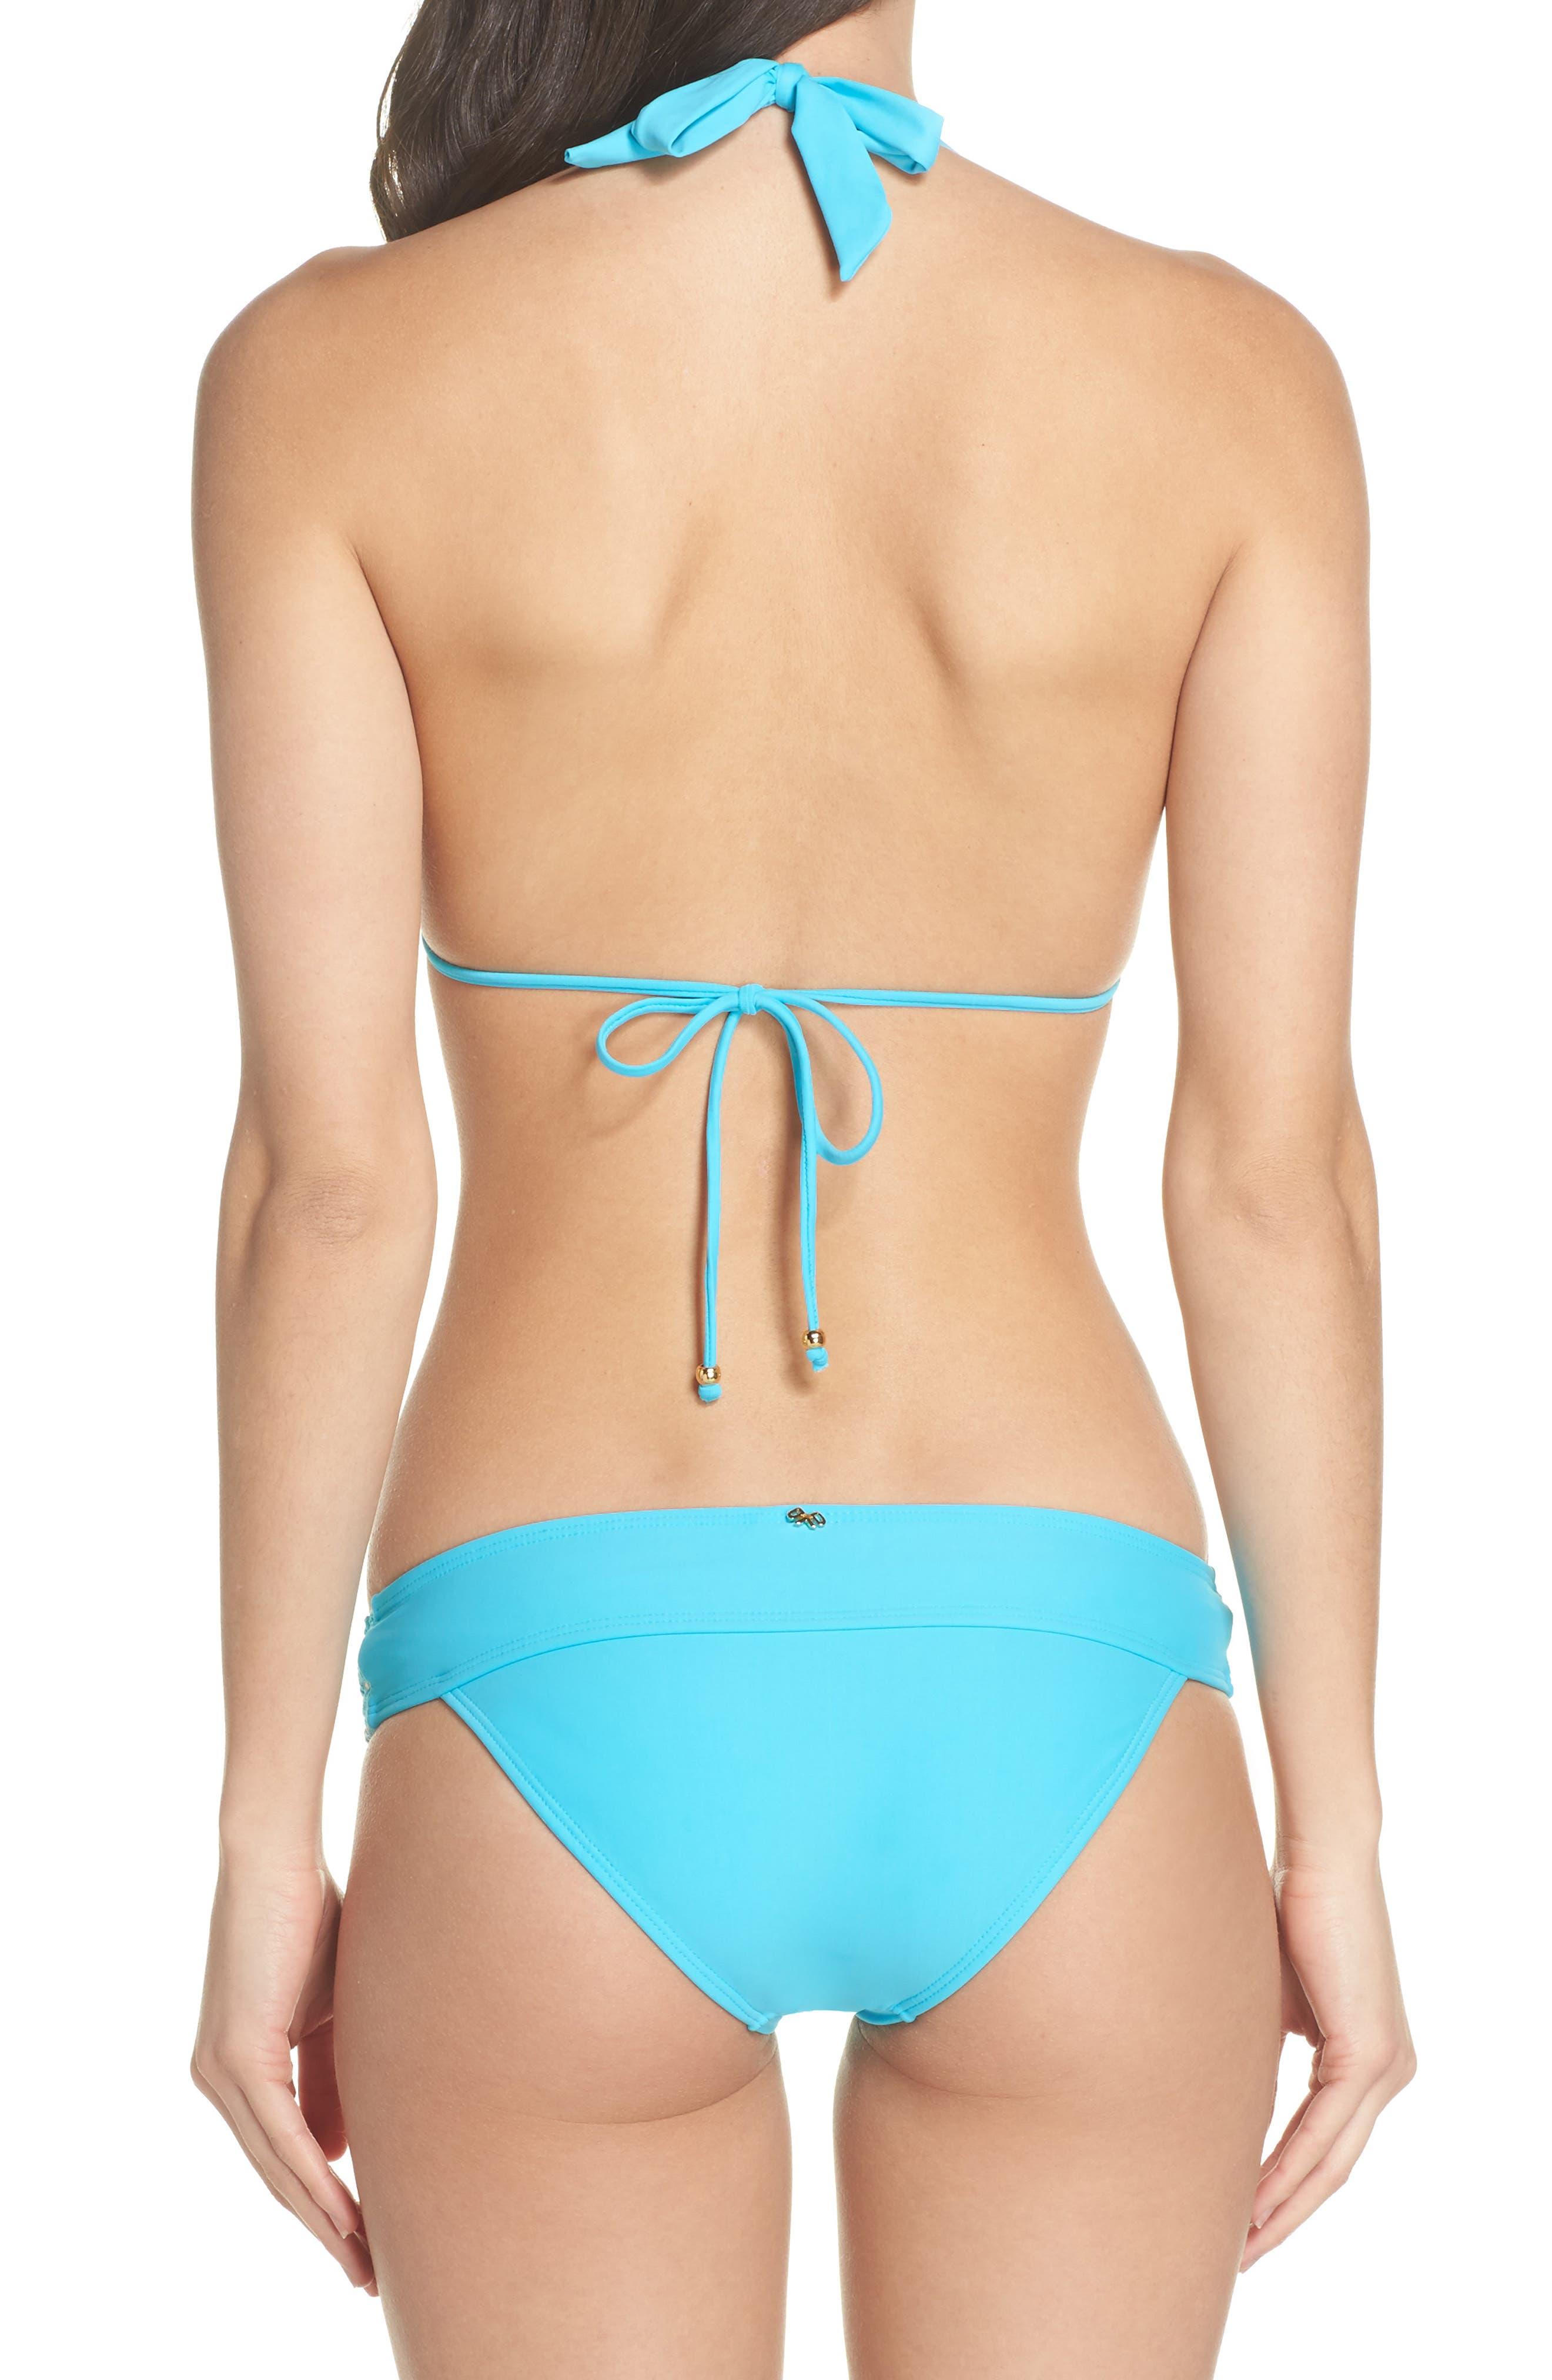 Banded Lace Bikini Bottoms,                             Alternate thumbnail 6, color,                             Marine